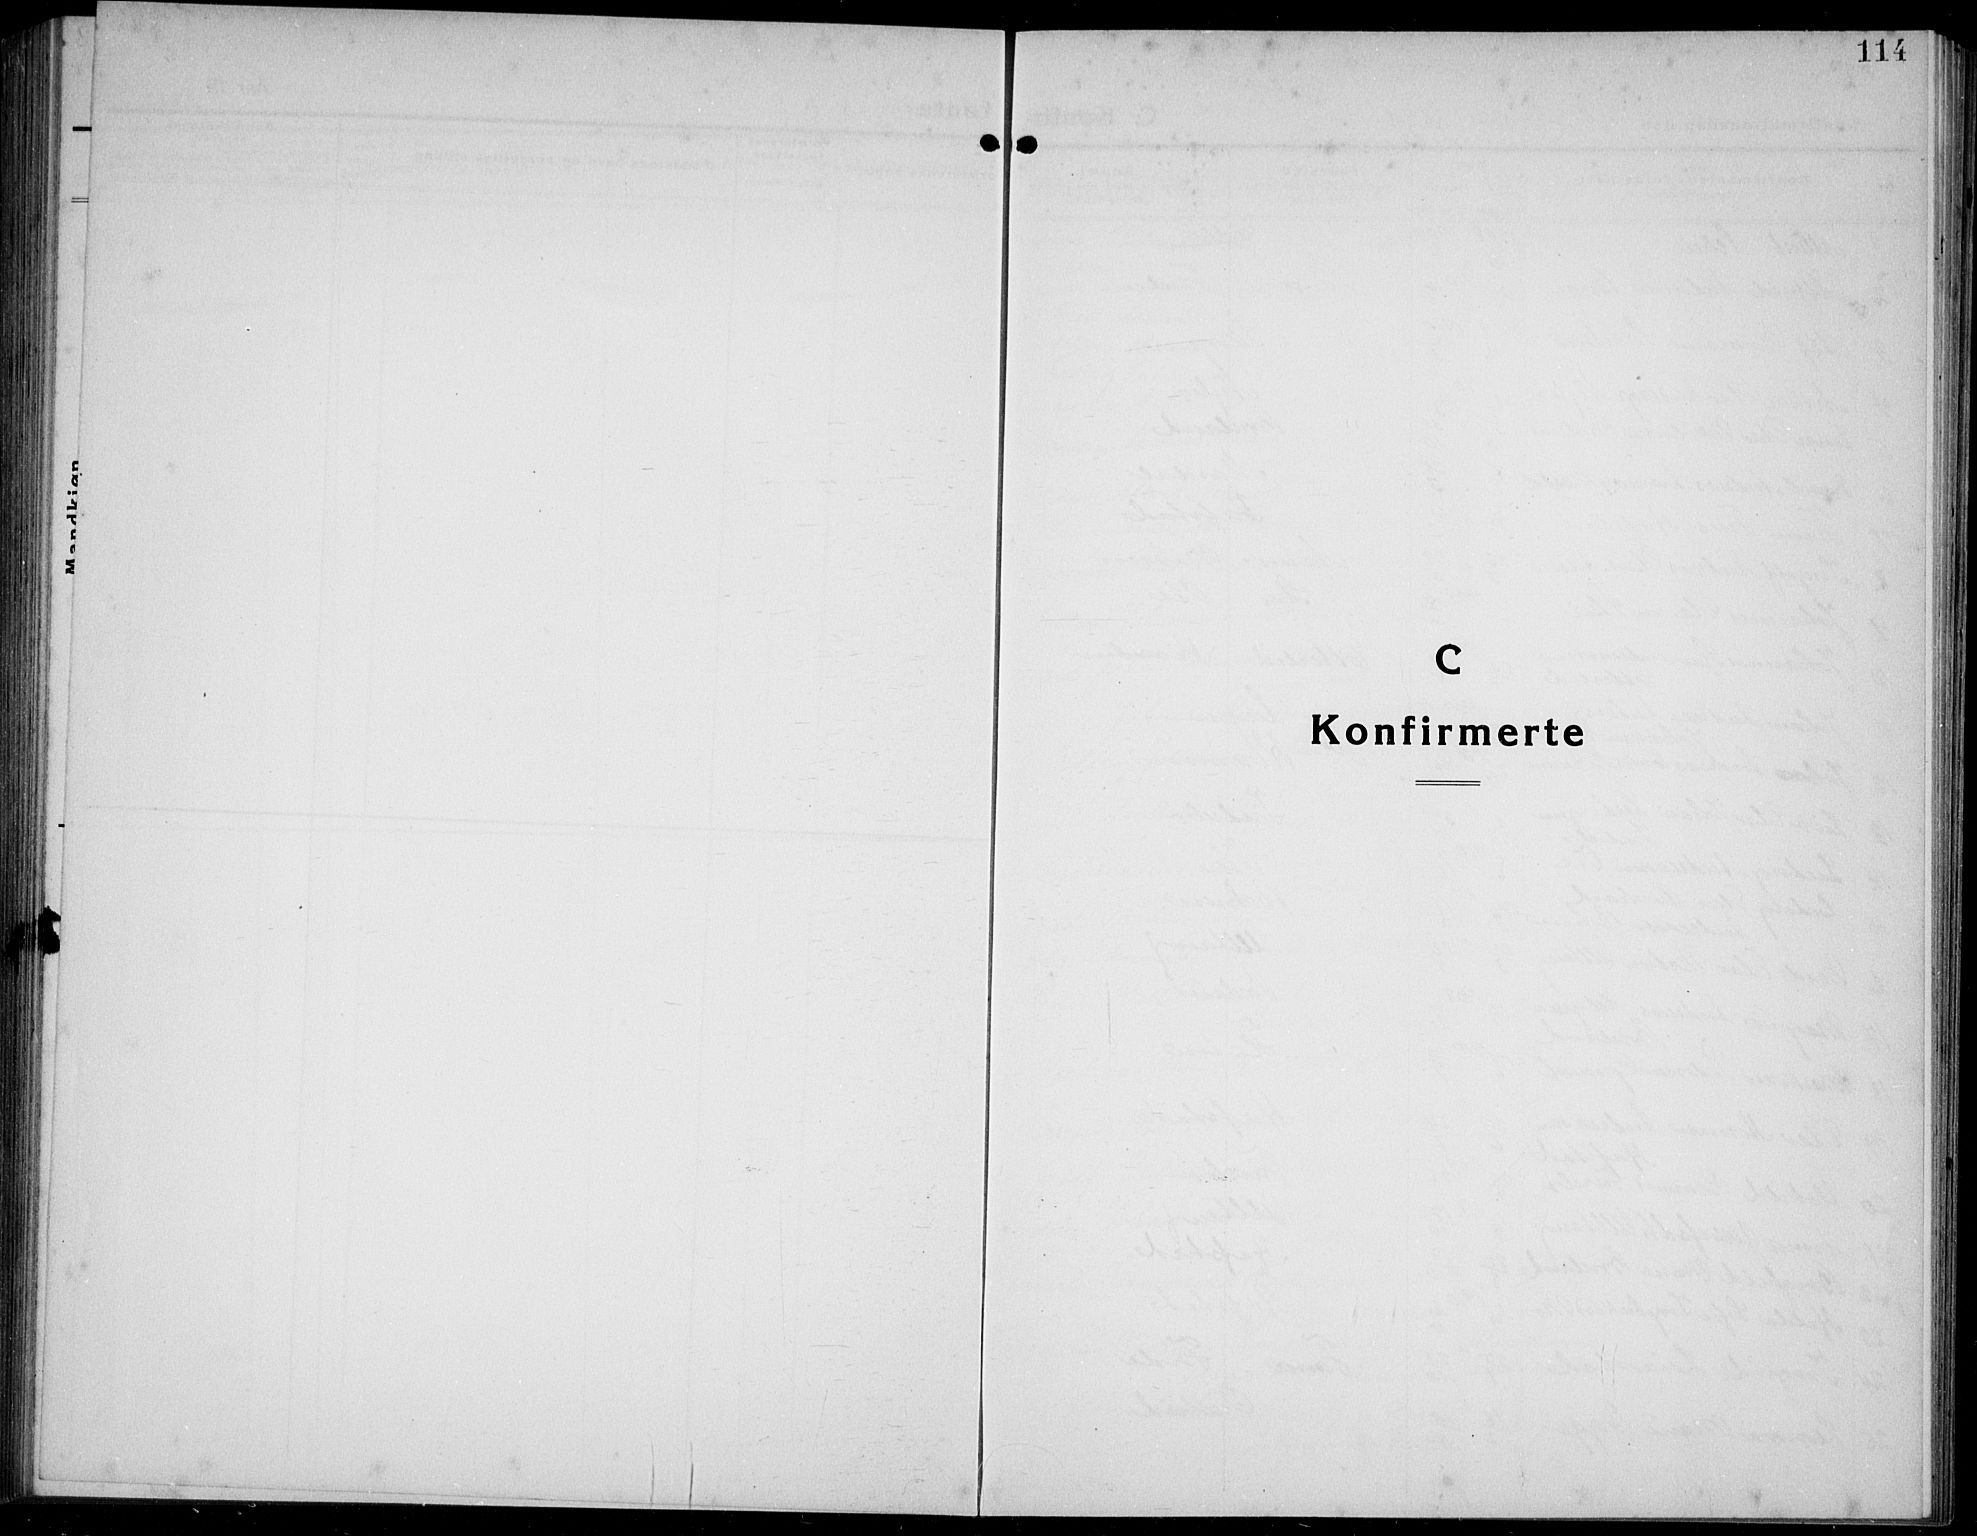 SAB, Førde sokneprestembete, H/Hab: Klokkerbok nr. A 4, 1924-1941, s. 114